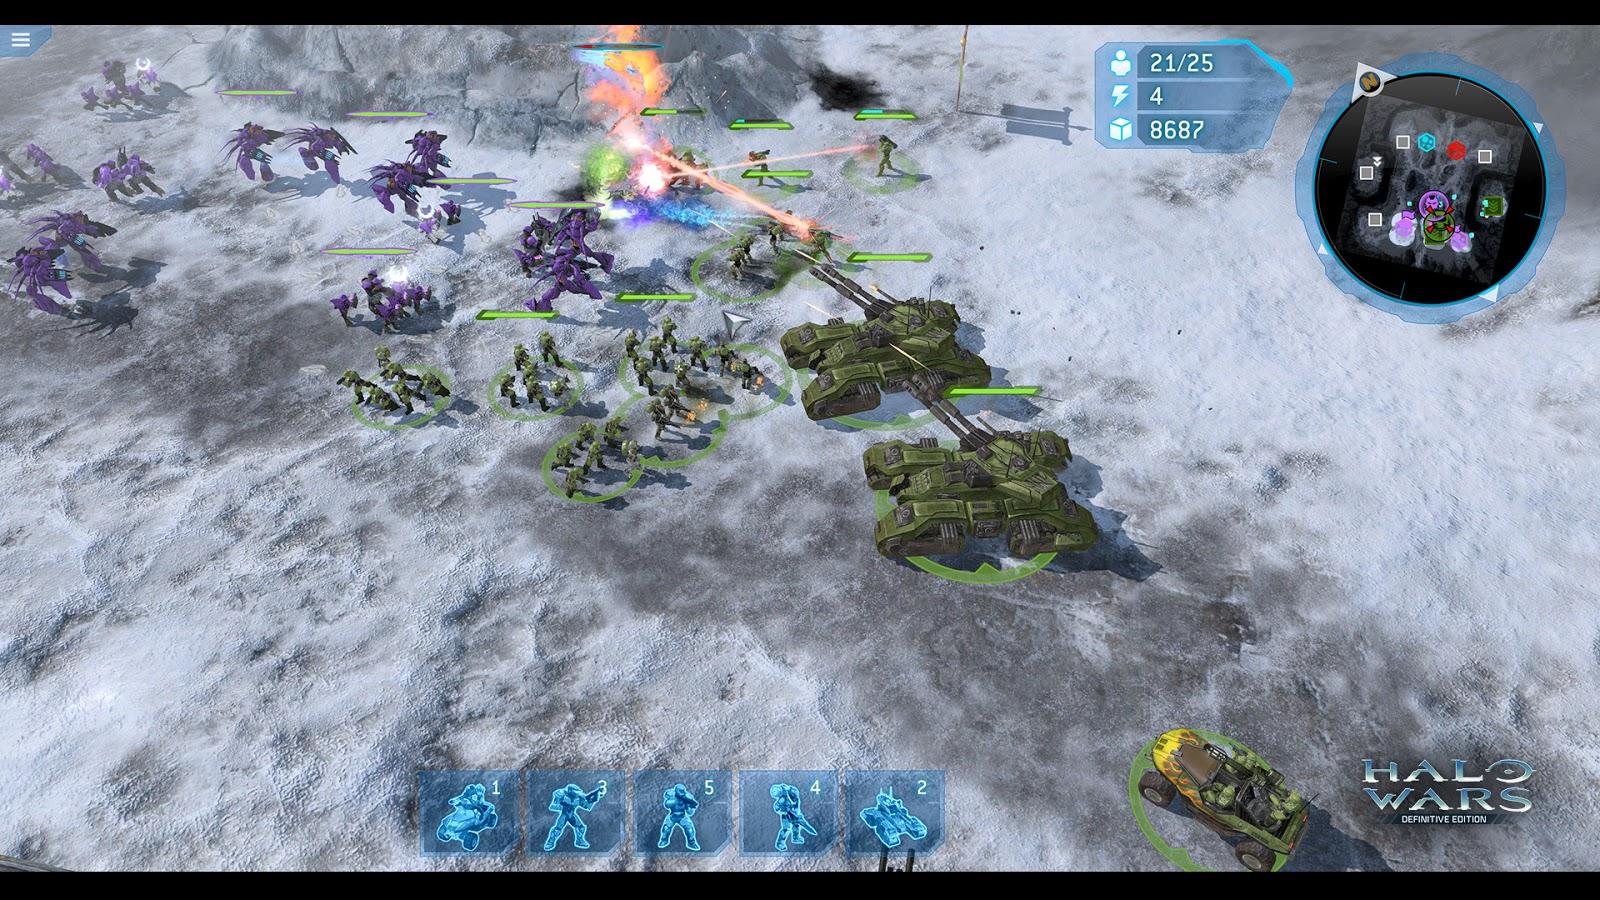 Halo Wars Definitive Edition ESPAÑOL PC Full + Hotfix 2 (CODEX) + REPACK 2 DVD5 (JPW) 1